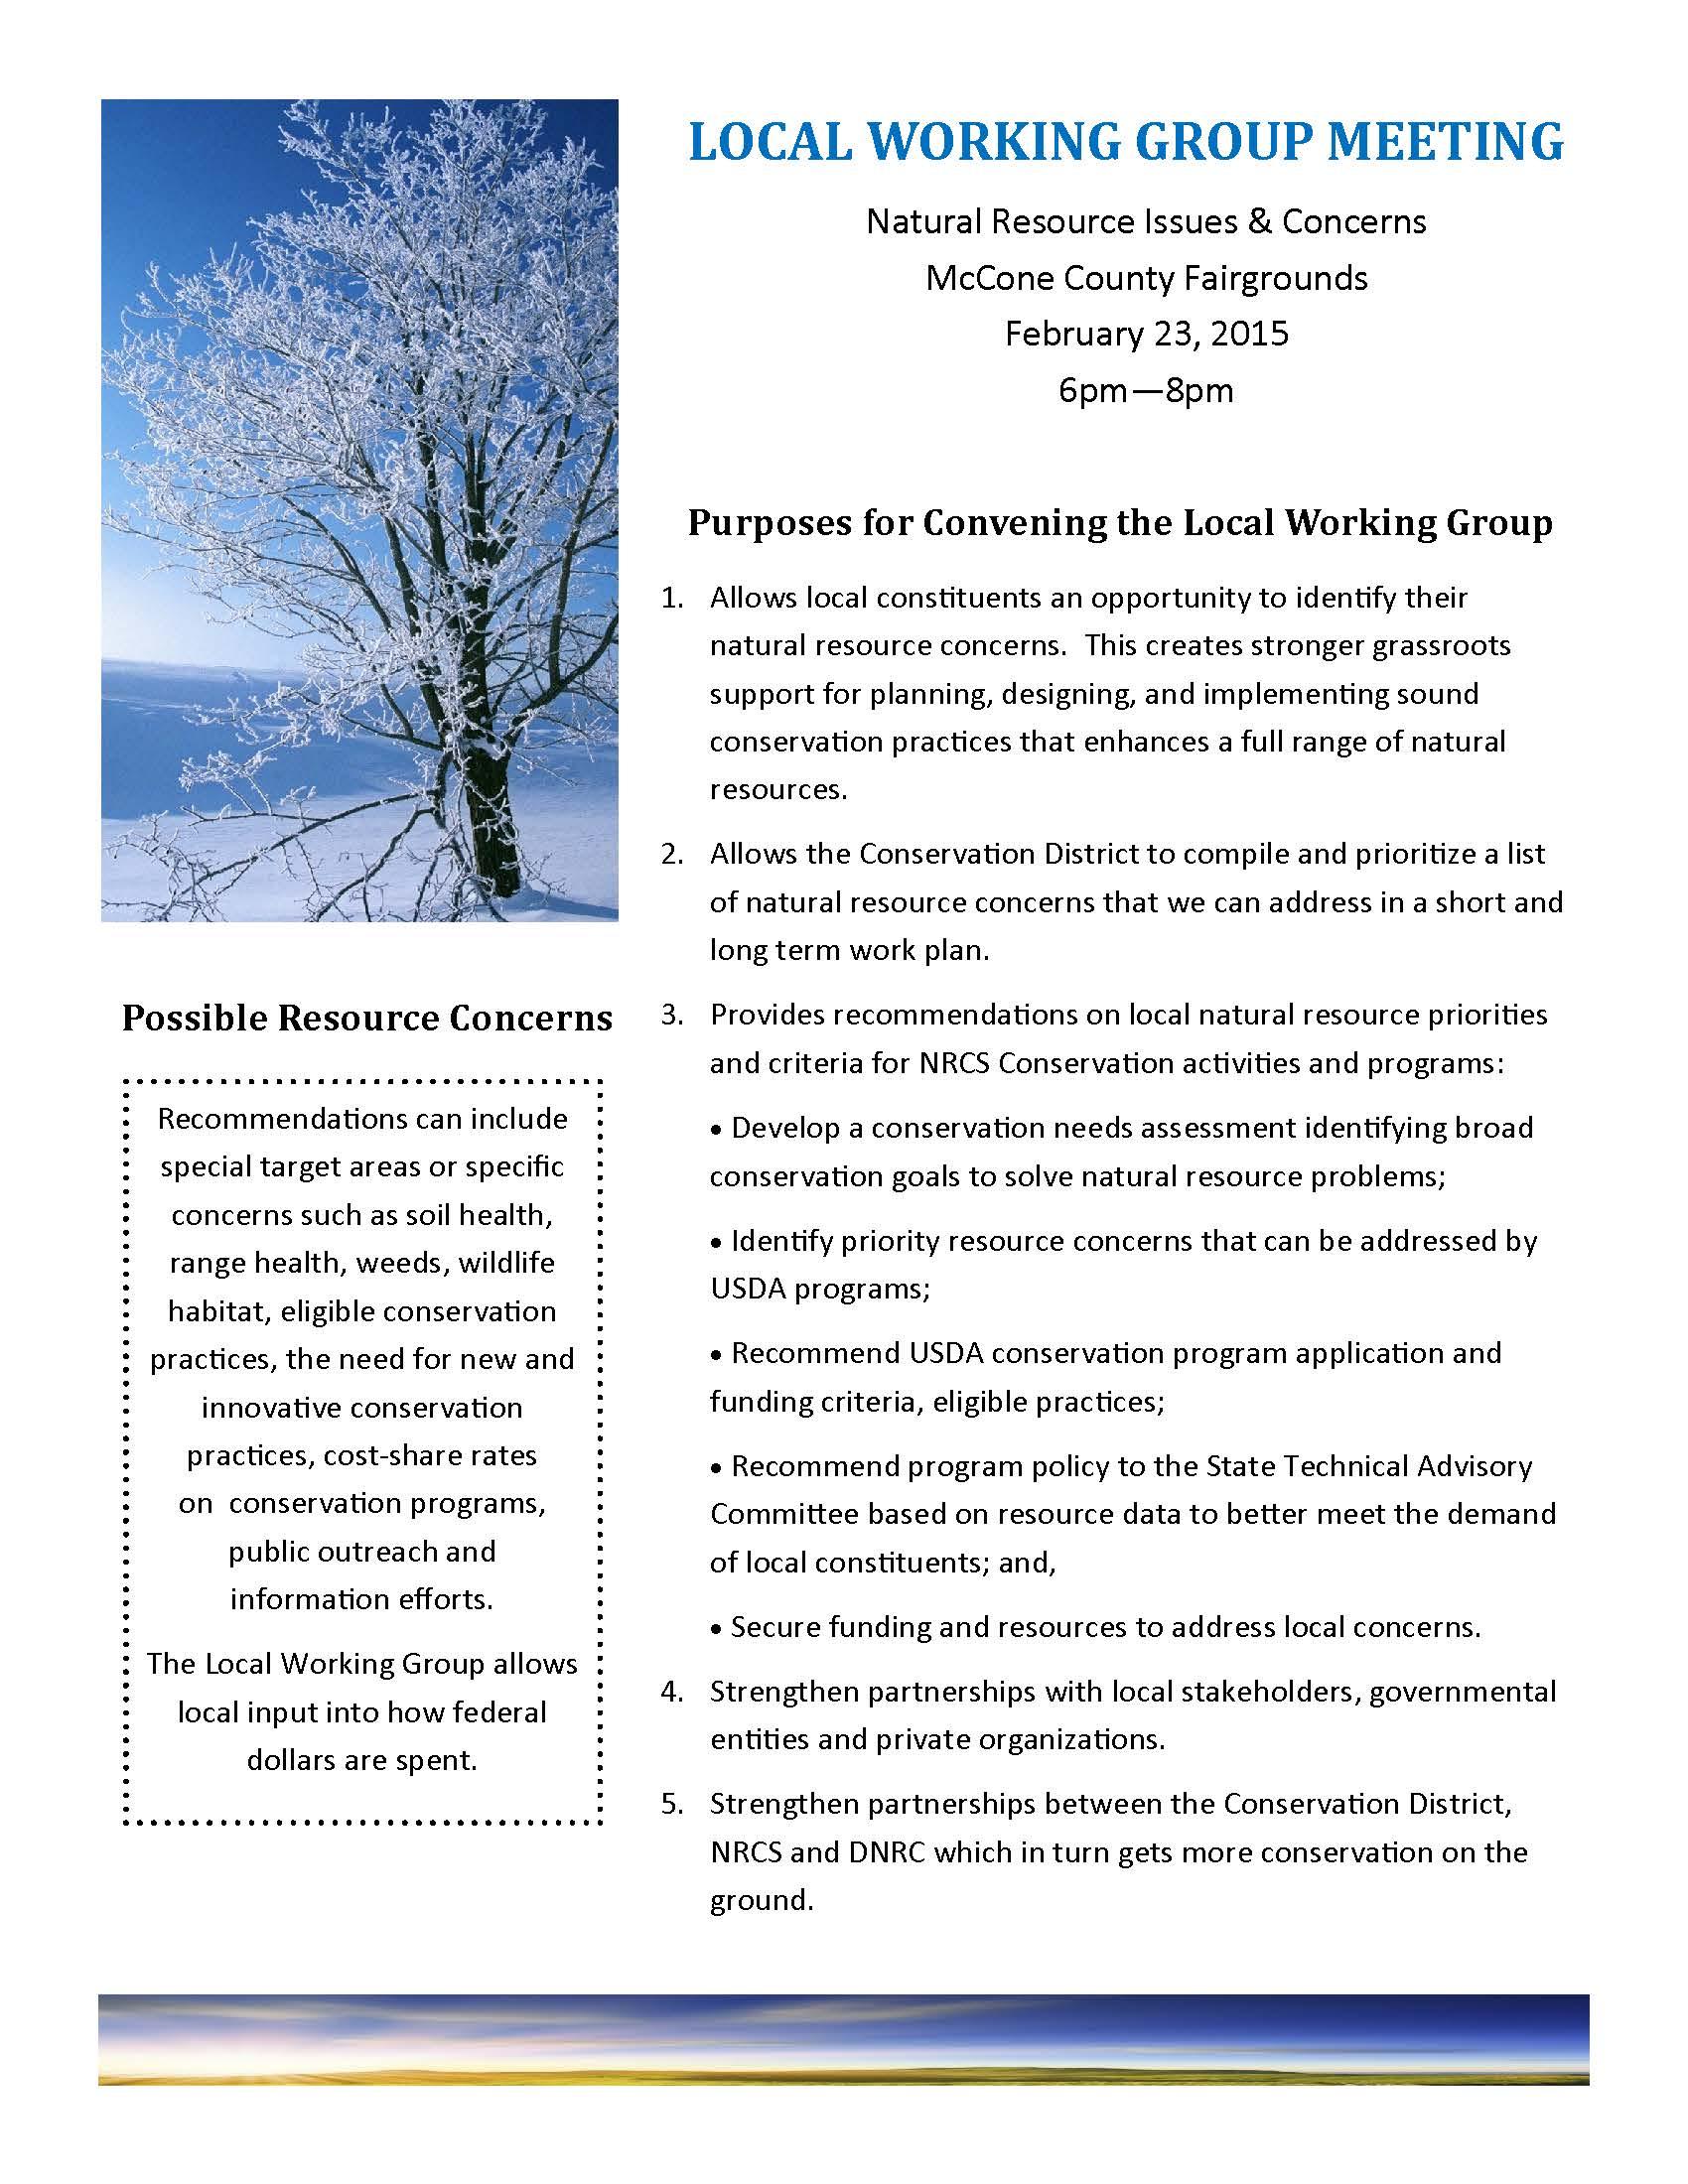 Montana mccone county circle - Lwg Info Sheet